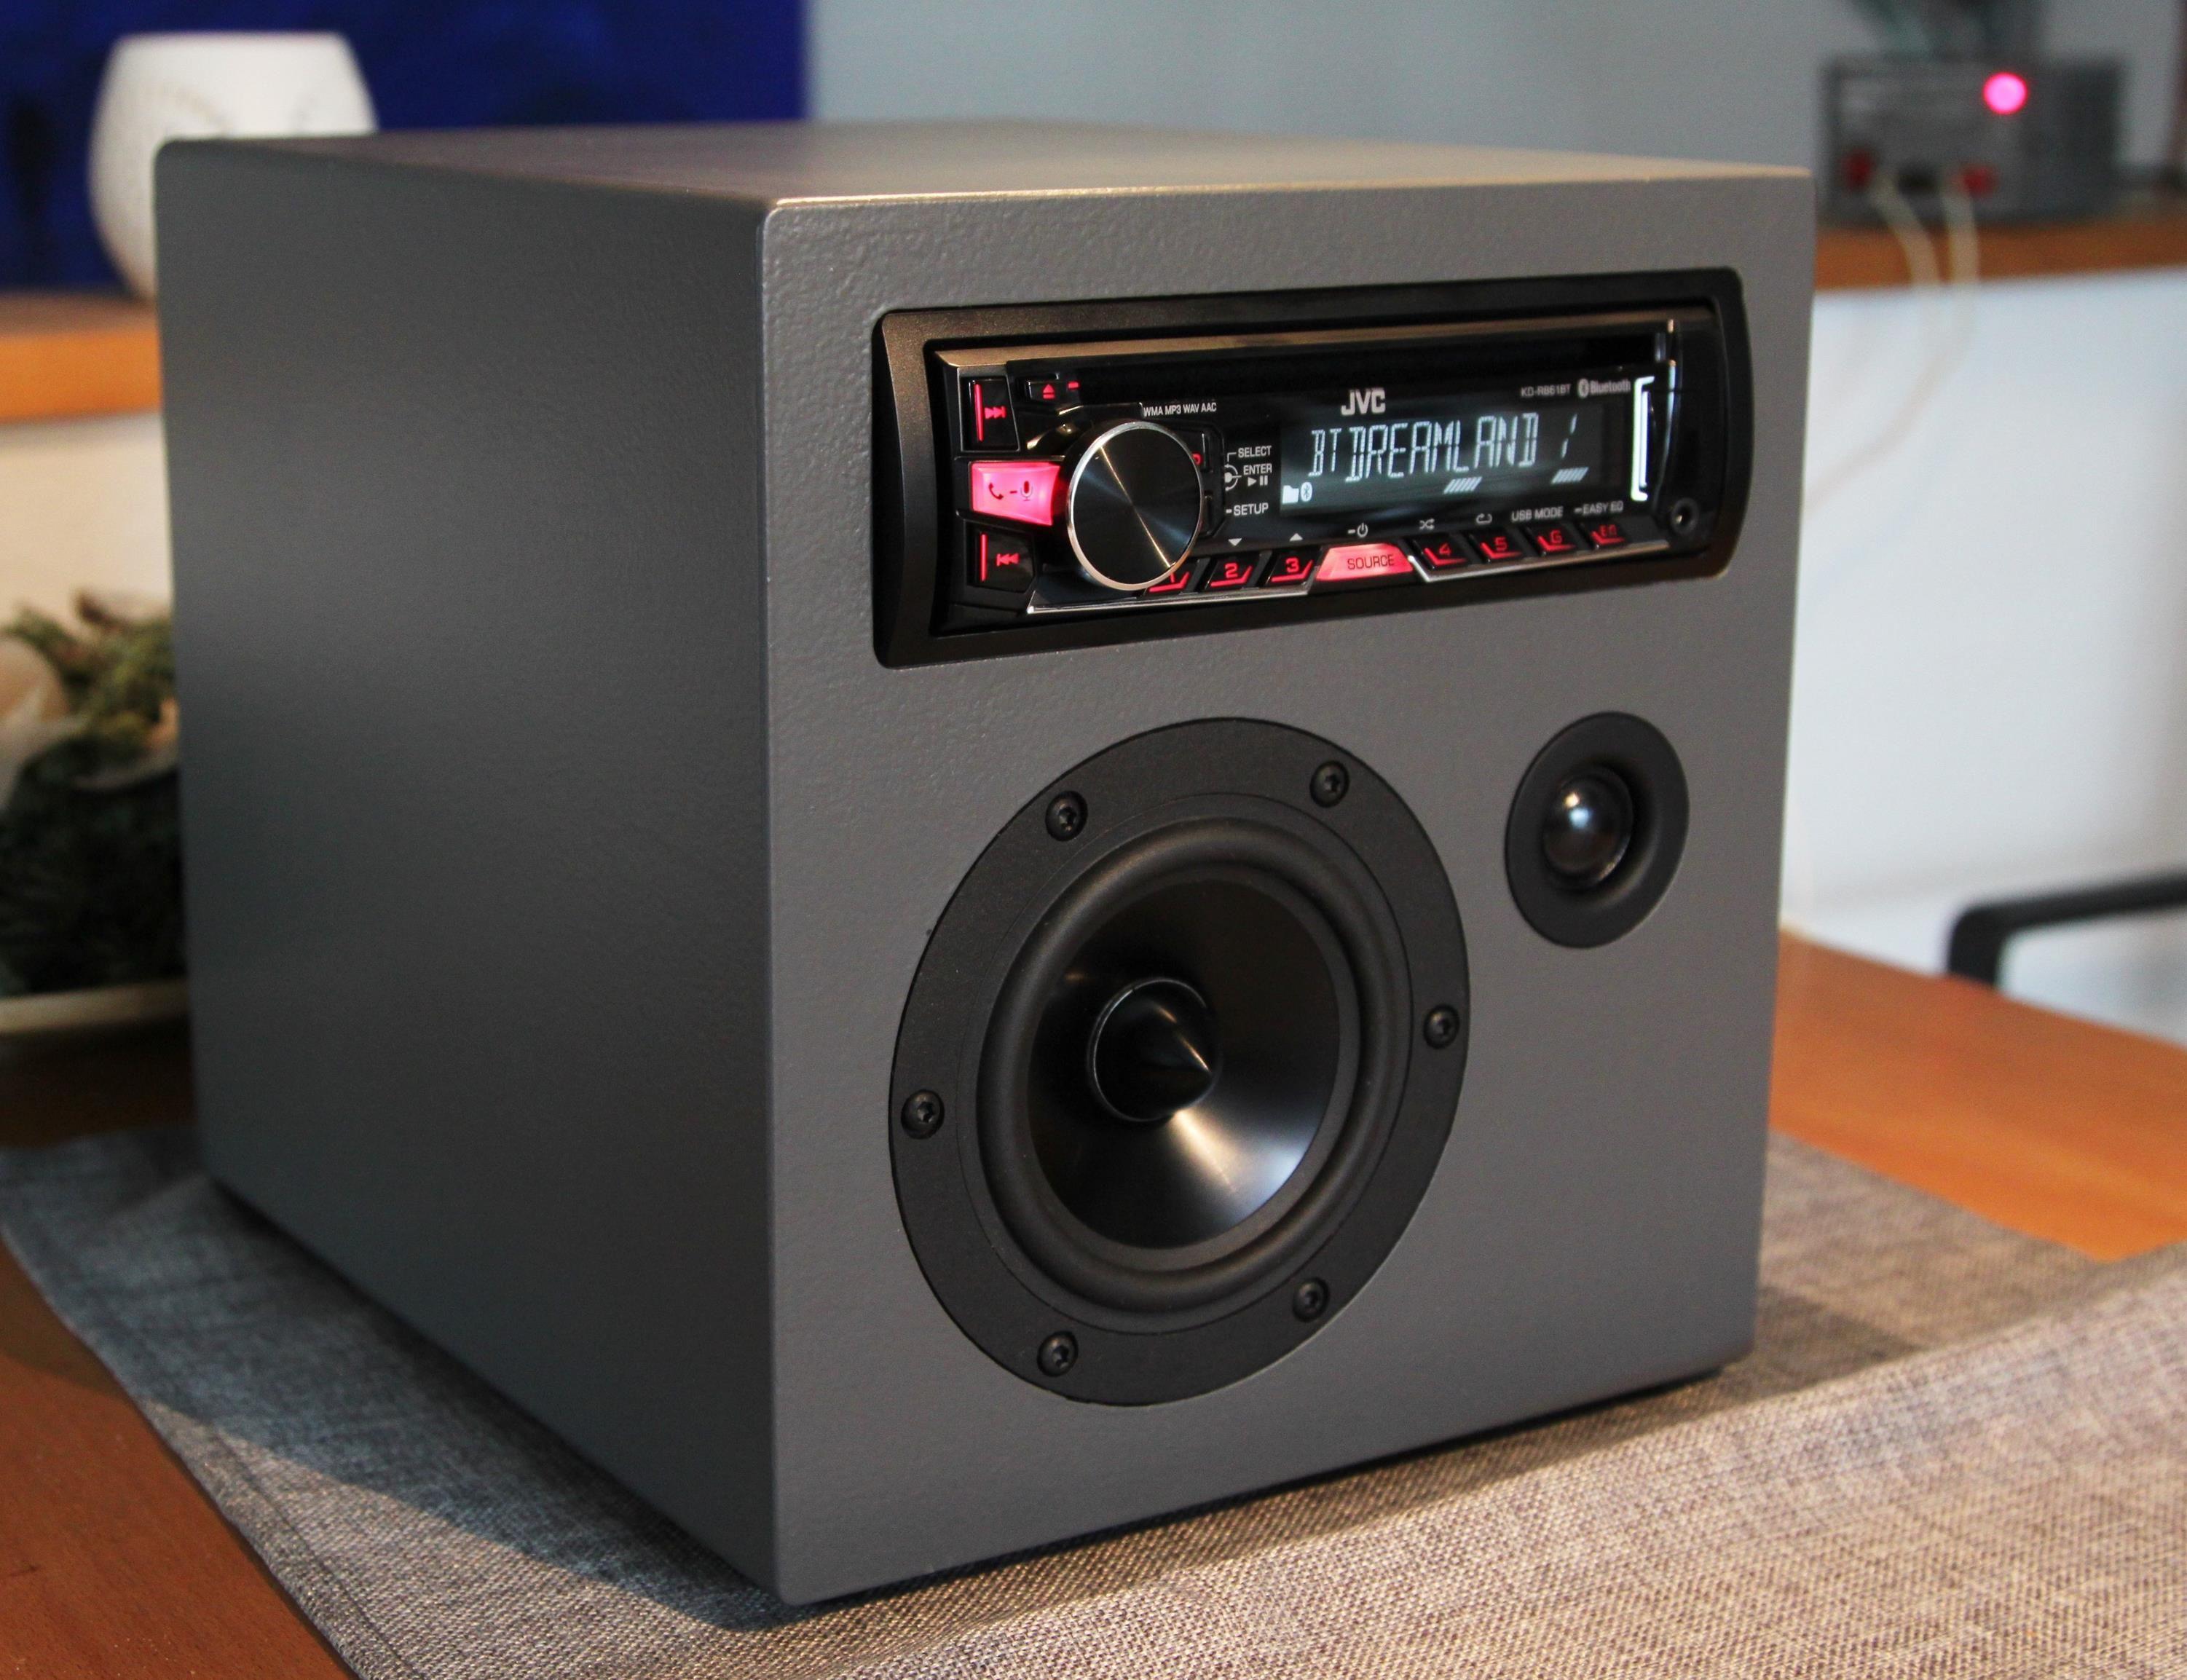 Mini Wireless Pocket Sized Bluetooth 4 2 Stereo Speakers Diy Boombox Diy Bluetooth Speaker Speaker